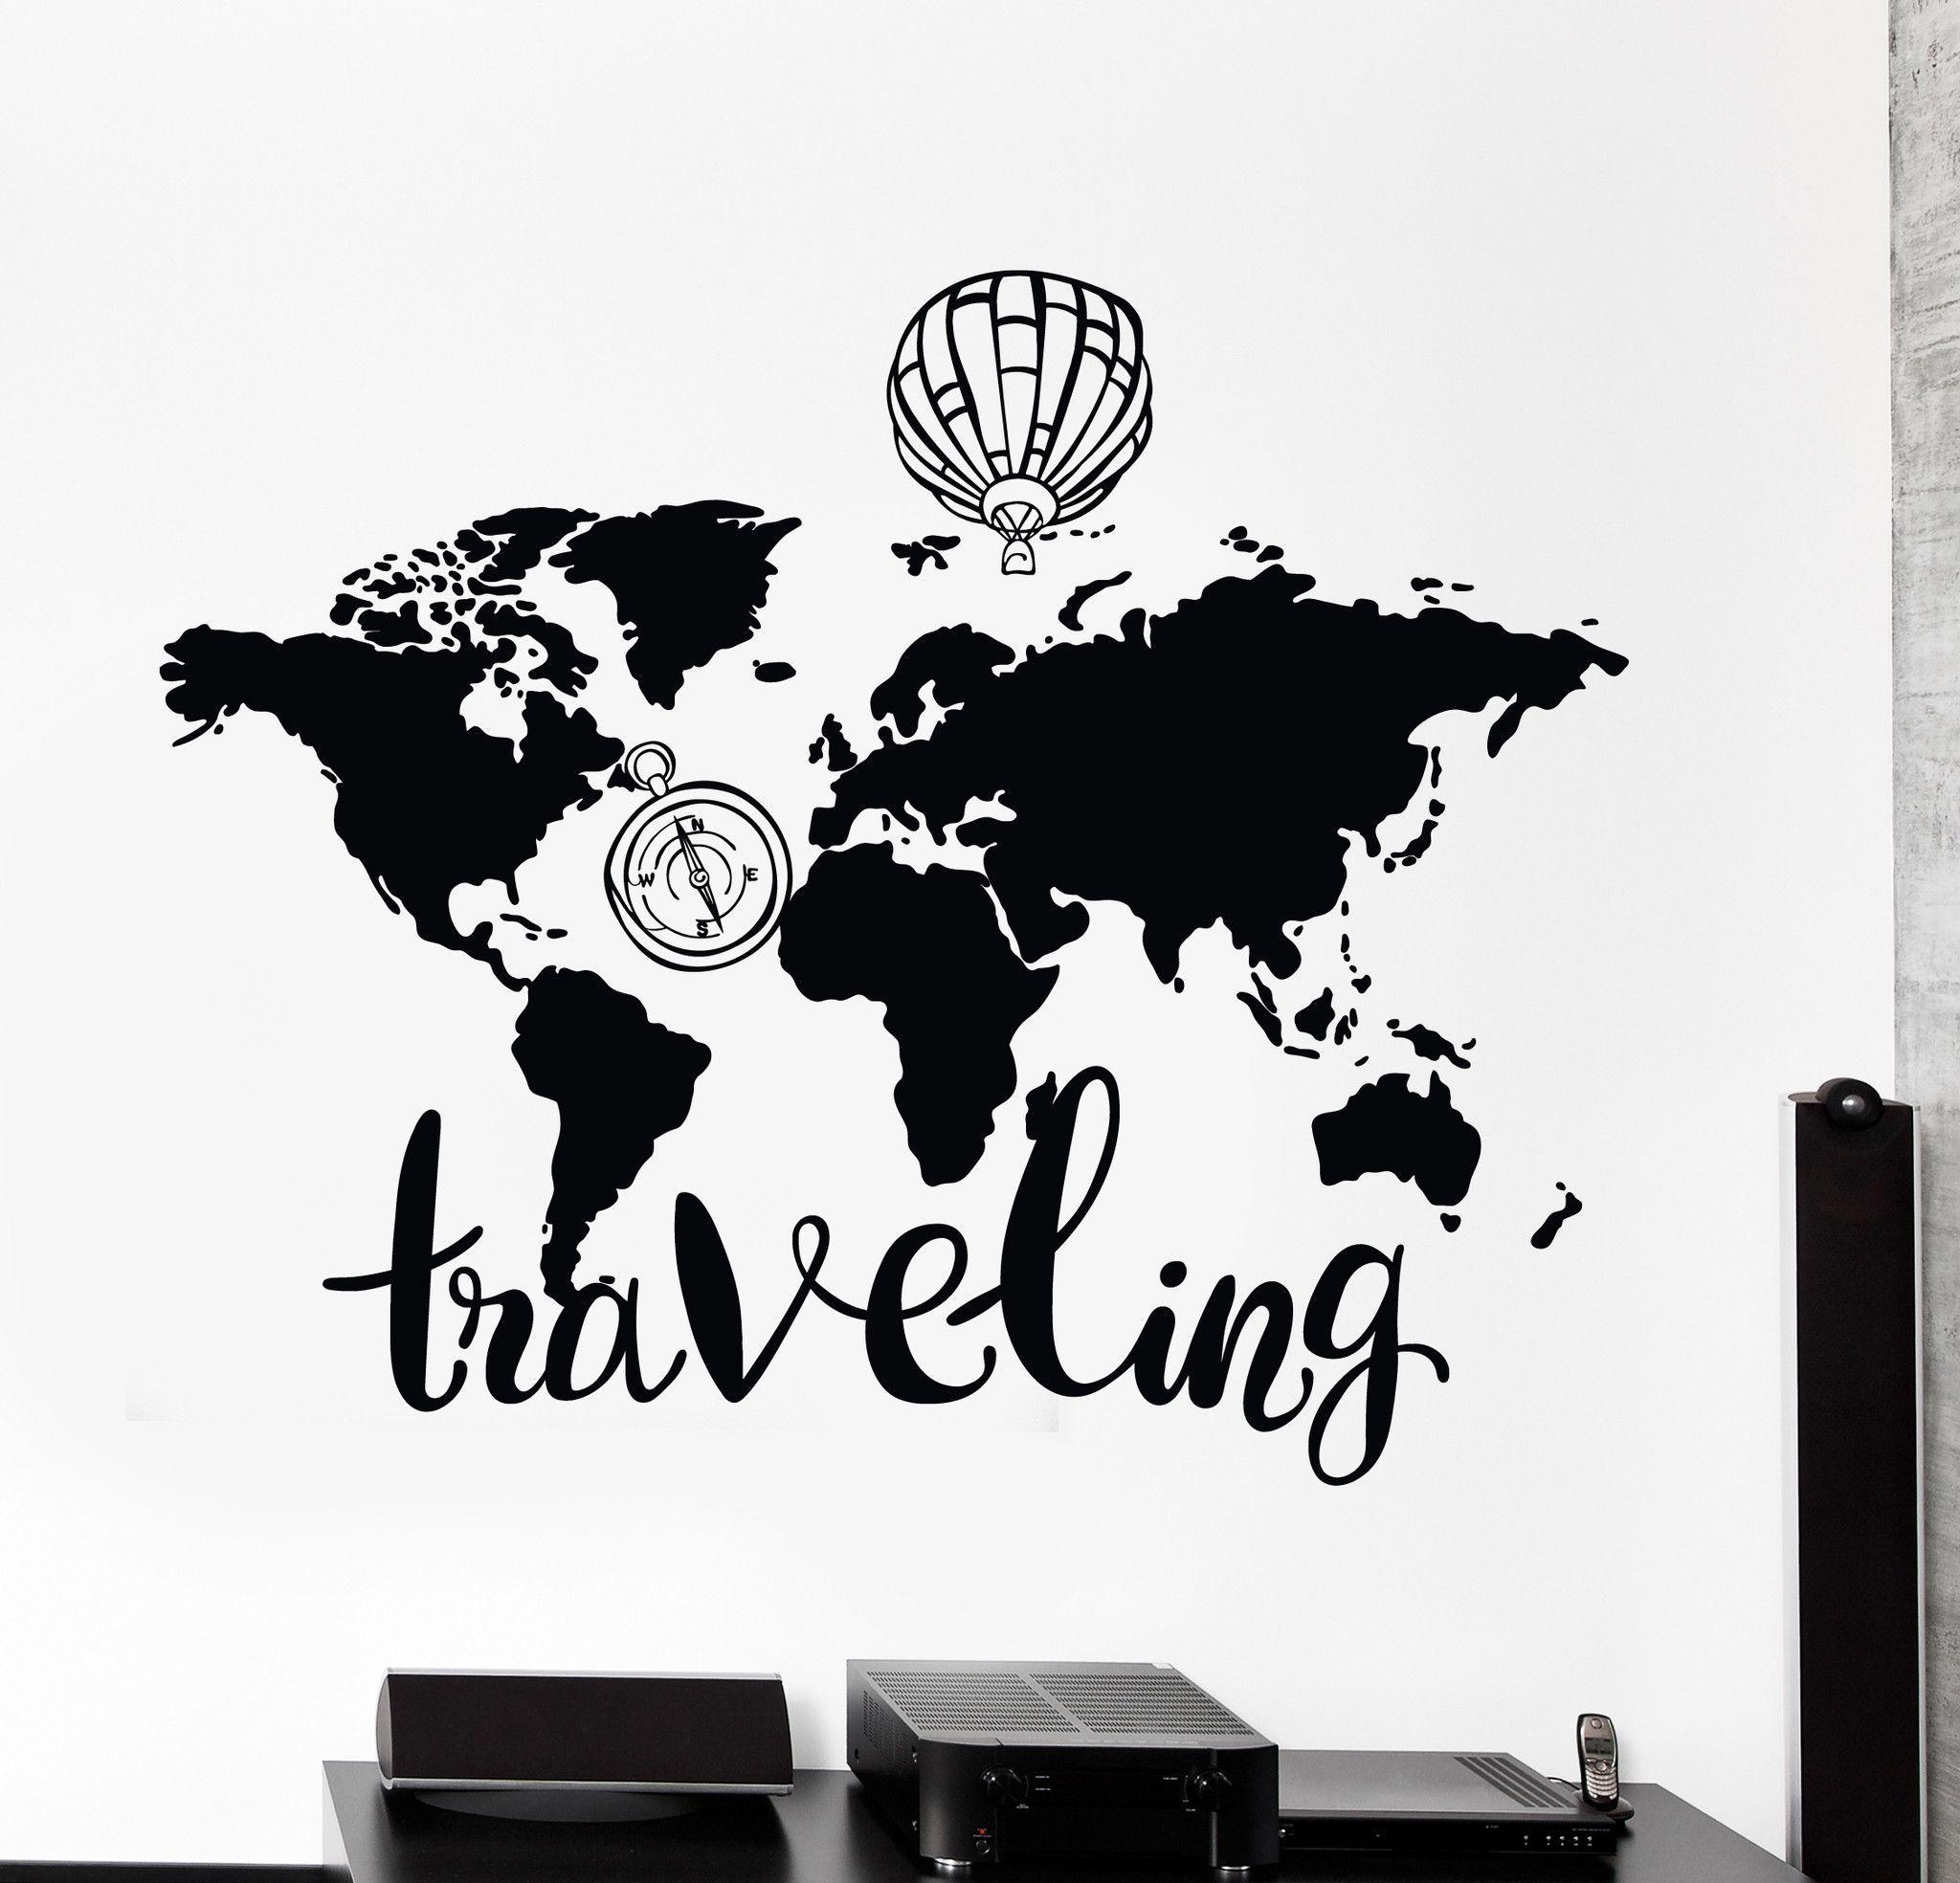 Wall Vinyl Decal World Map Air Balloon